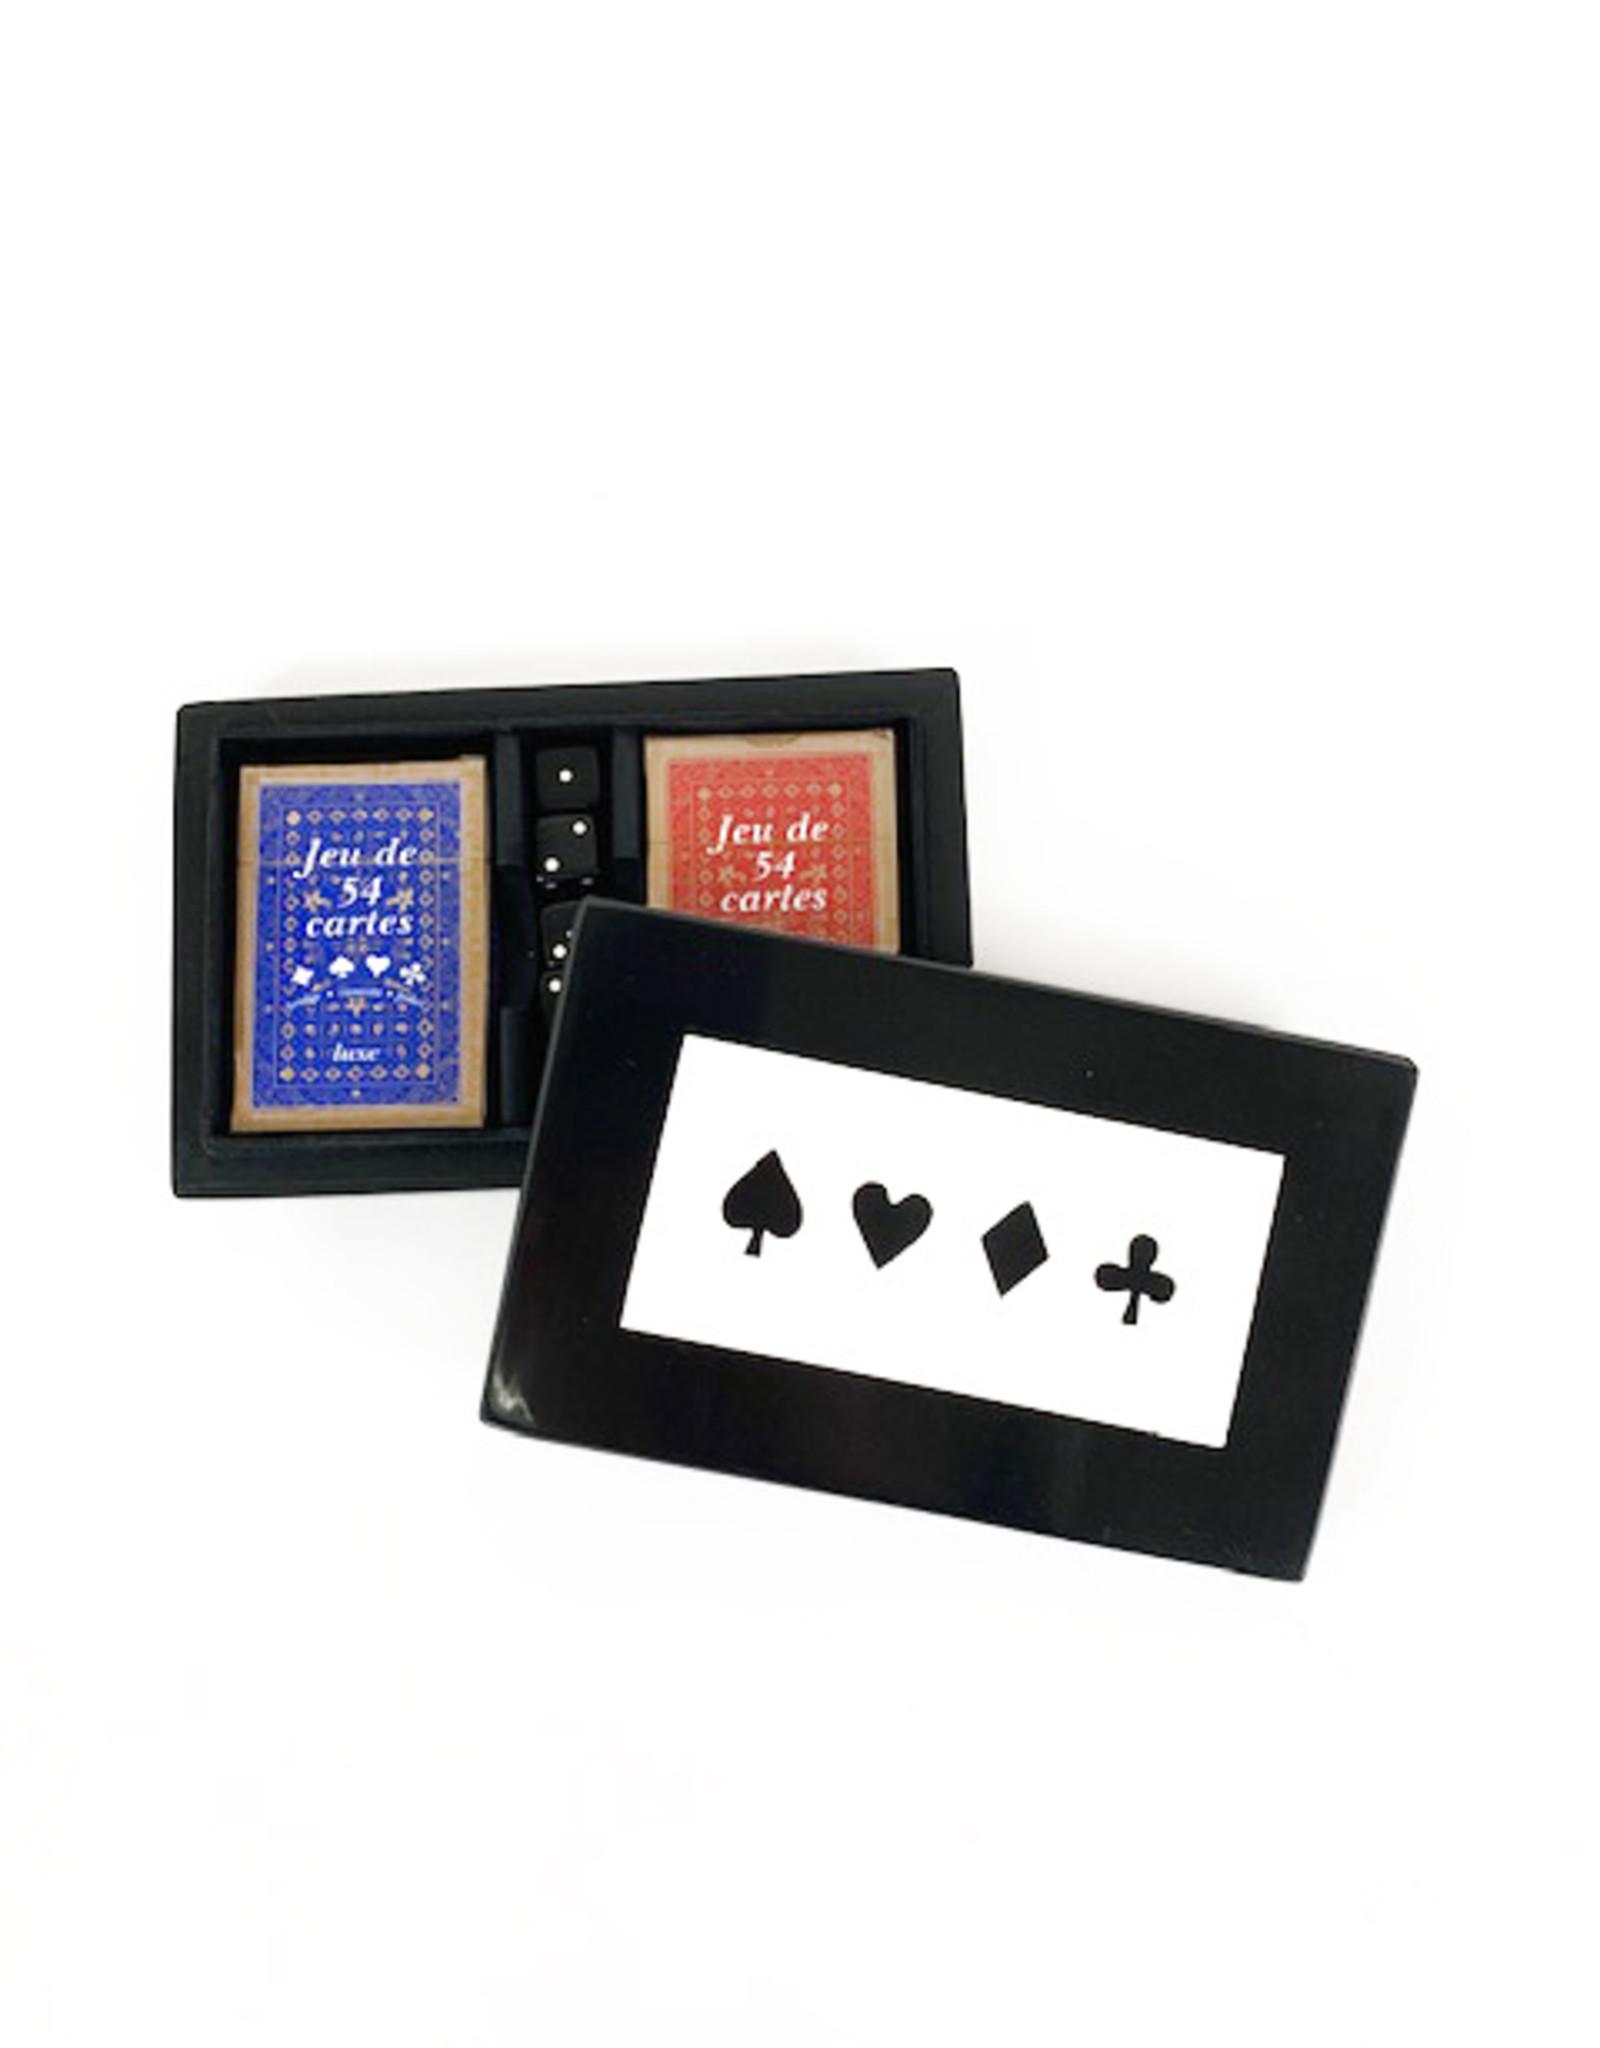 Card & dice box